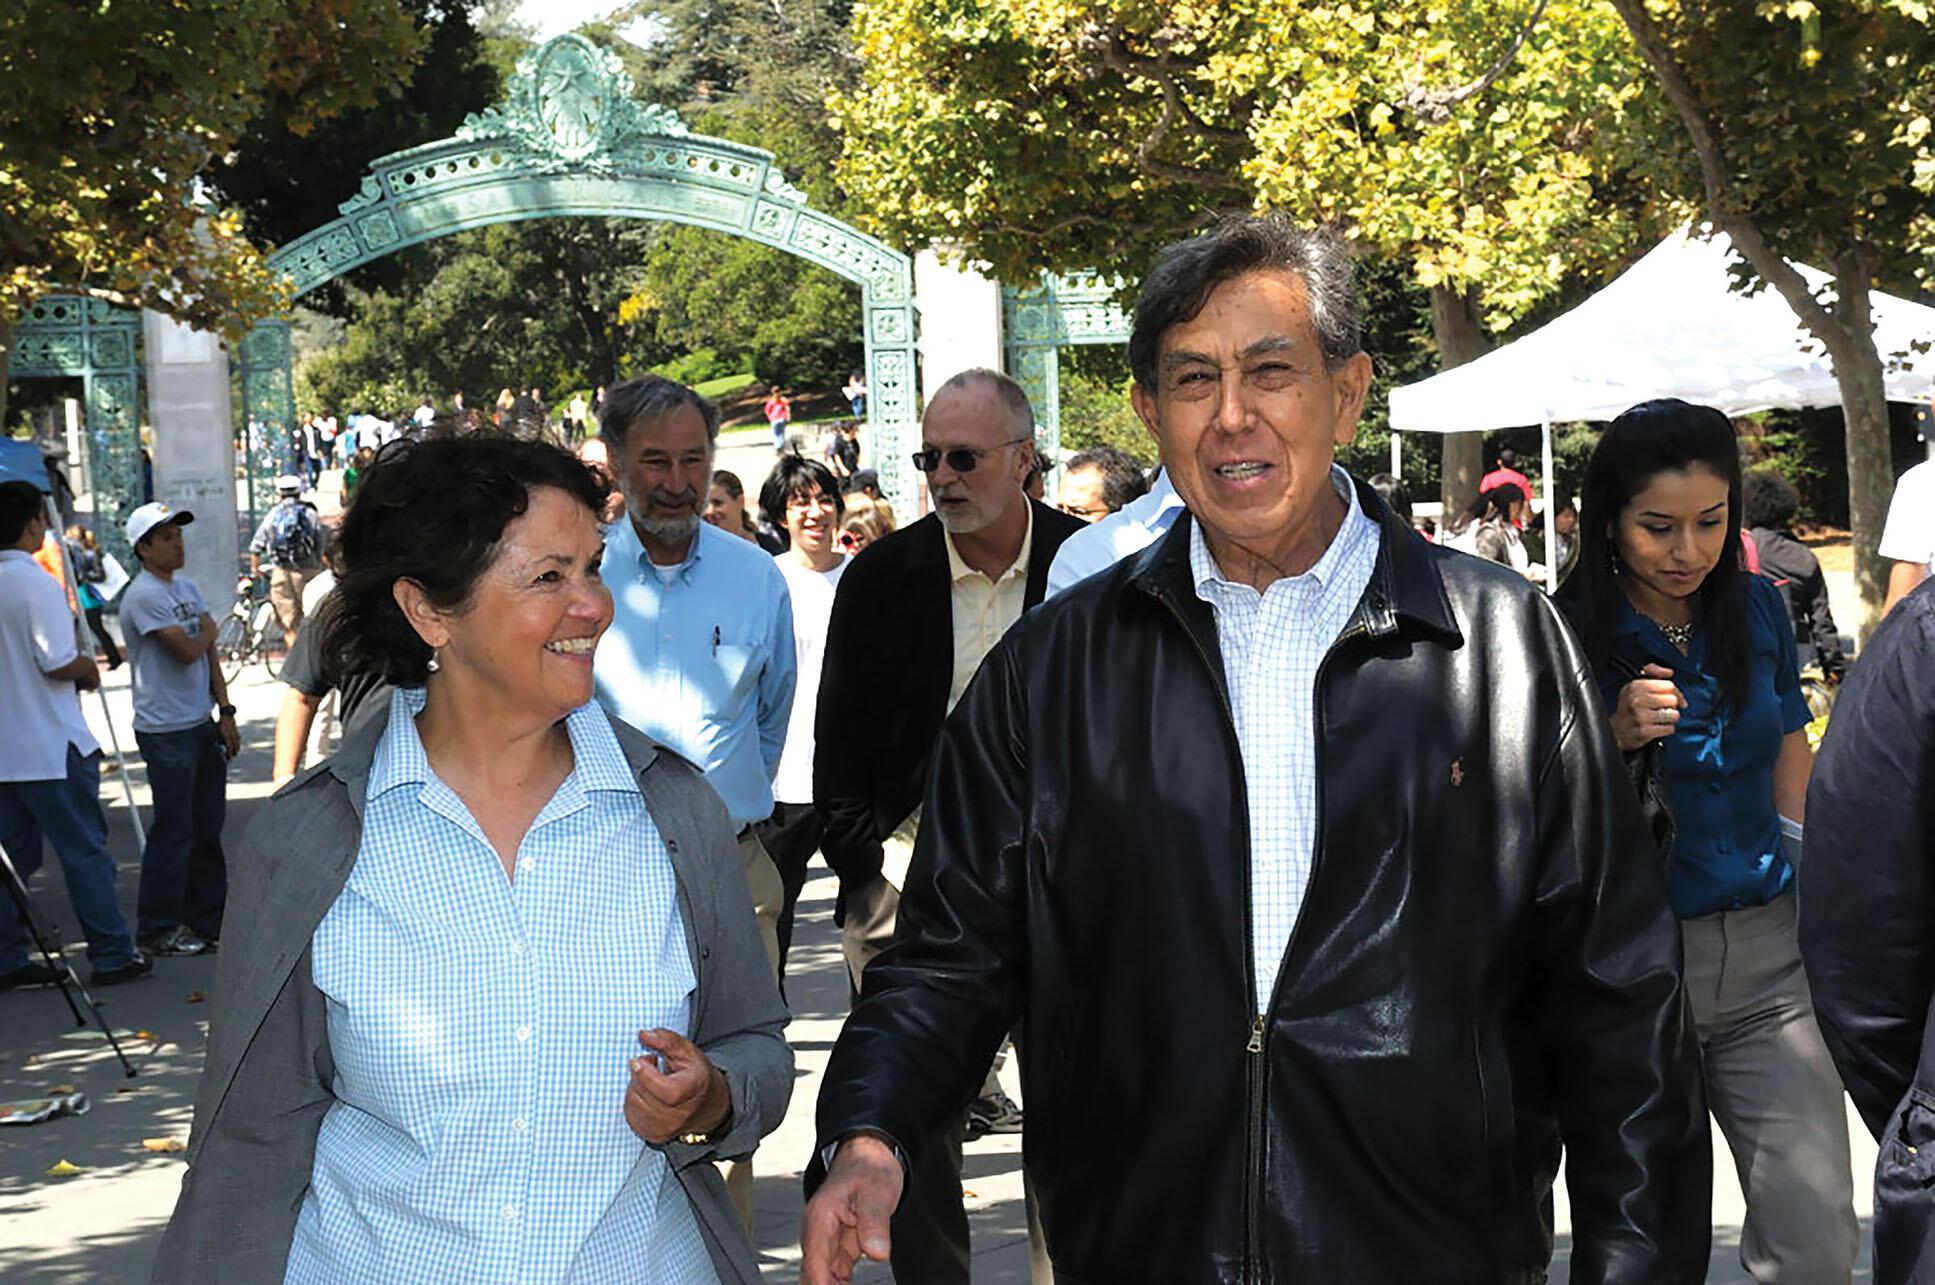 Beatriz Manz and Cuauhtémoc Cárdenas, followed by Steve Silberstein and David Bonior, walk on UC Berkeley's campus.